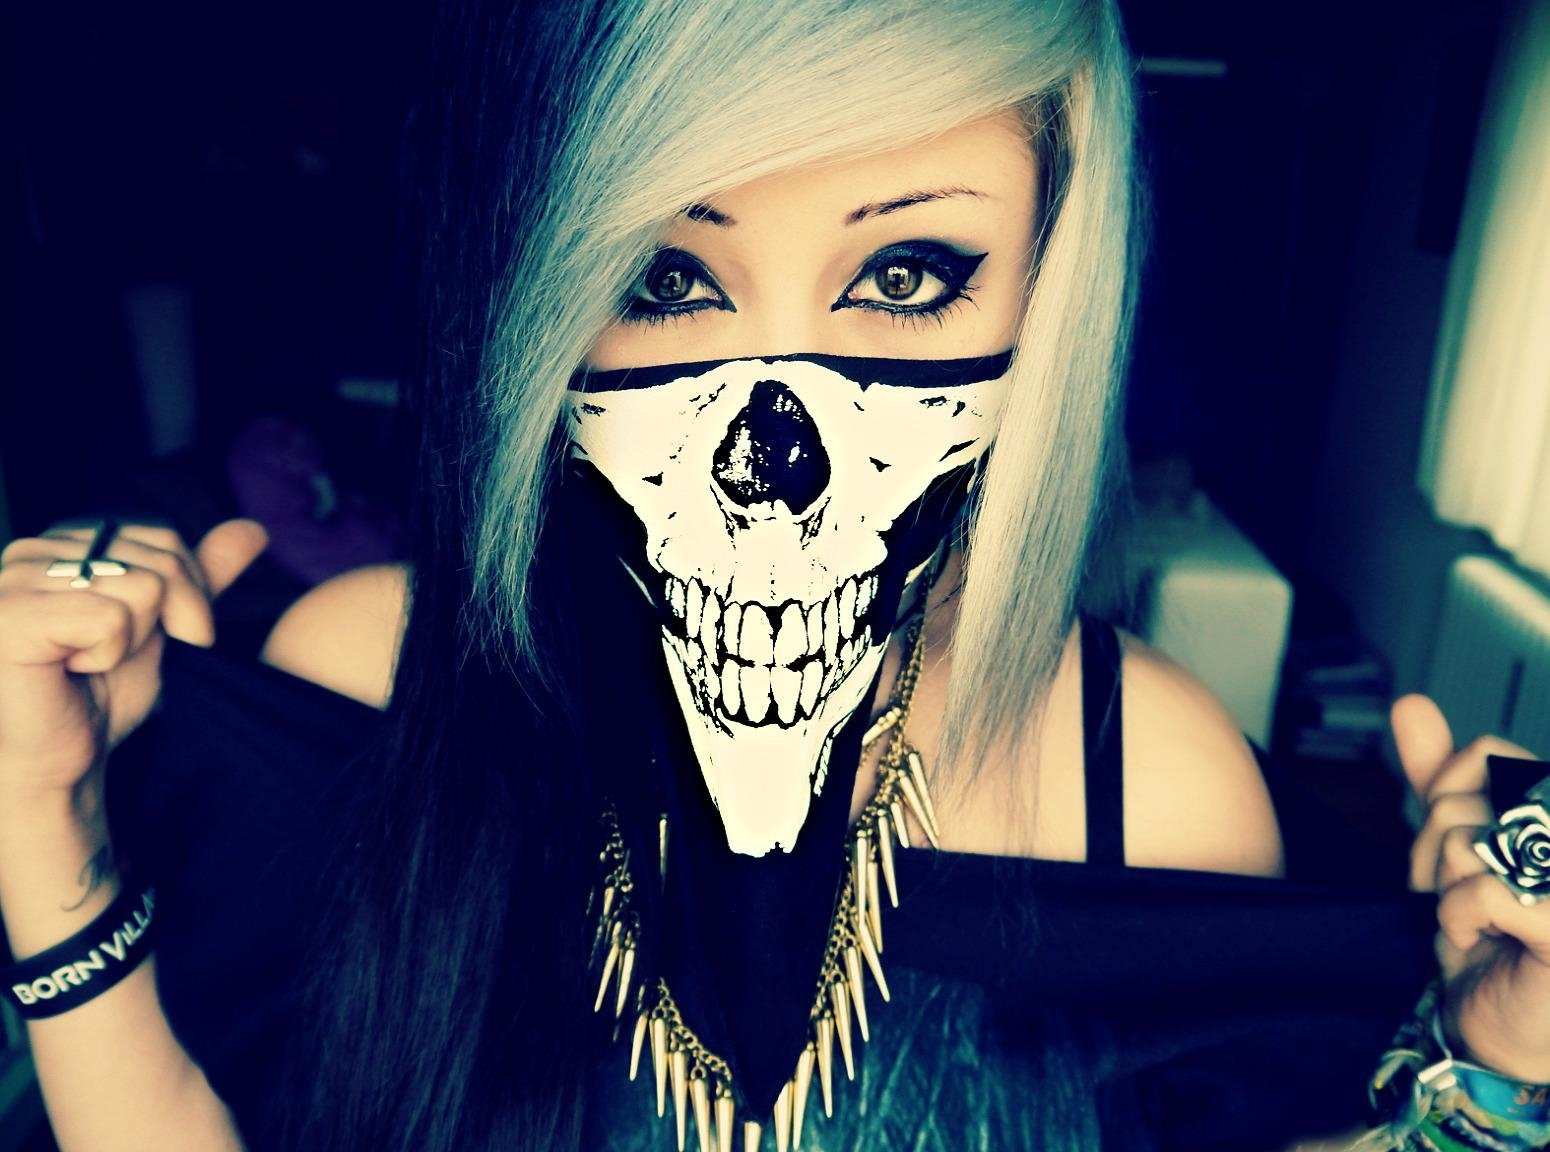 Emo Girl Skull Wallpaper And Background Image 1550x1152